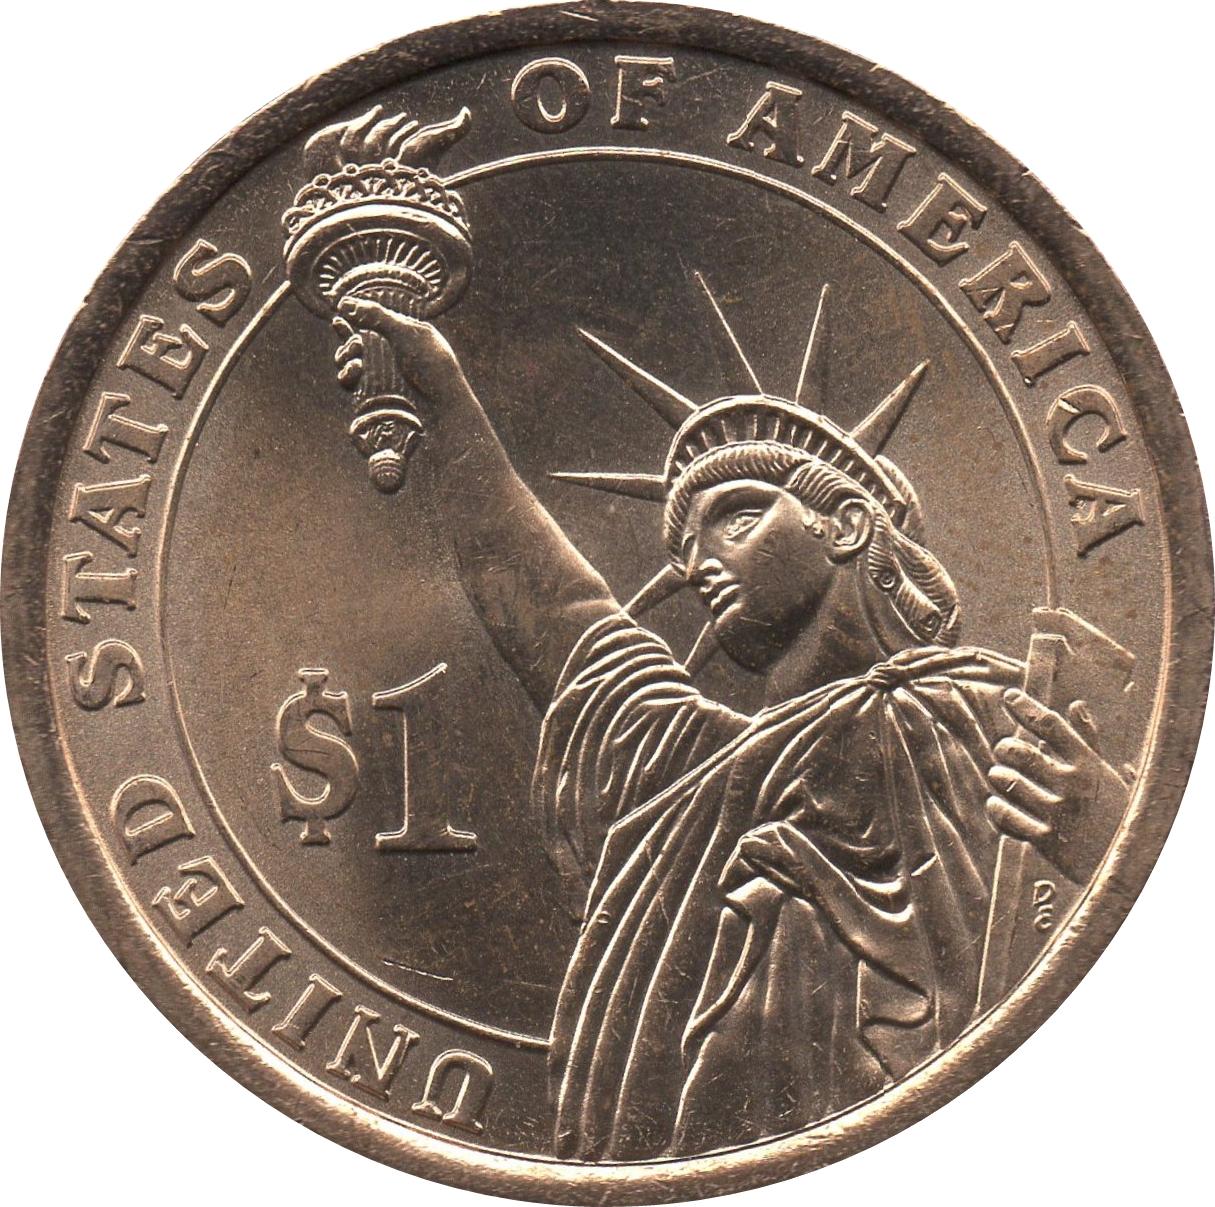 Johnson dollar $1 coins Denver BU UNC 2015 United States US Presidents Lyndon D